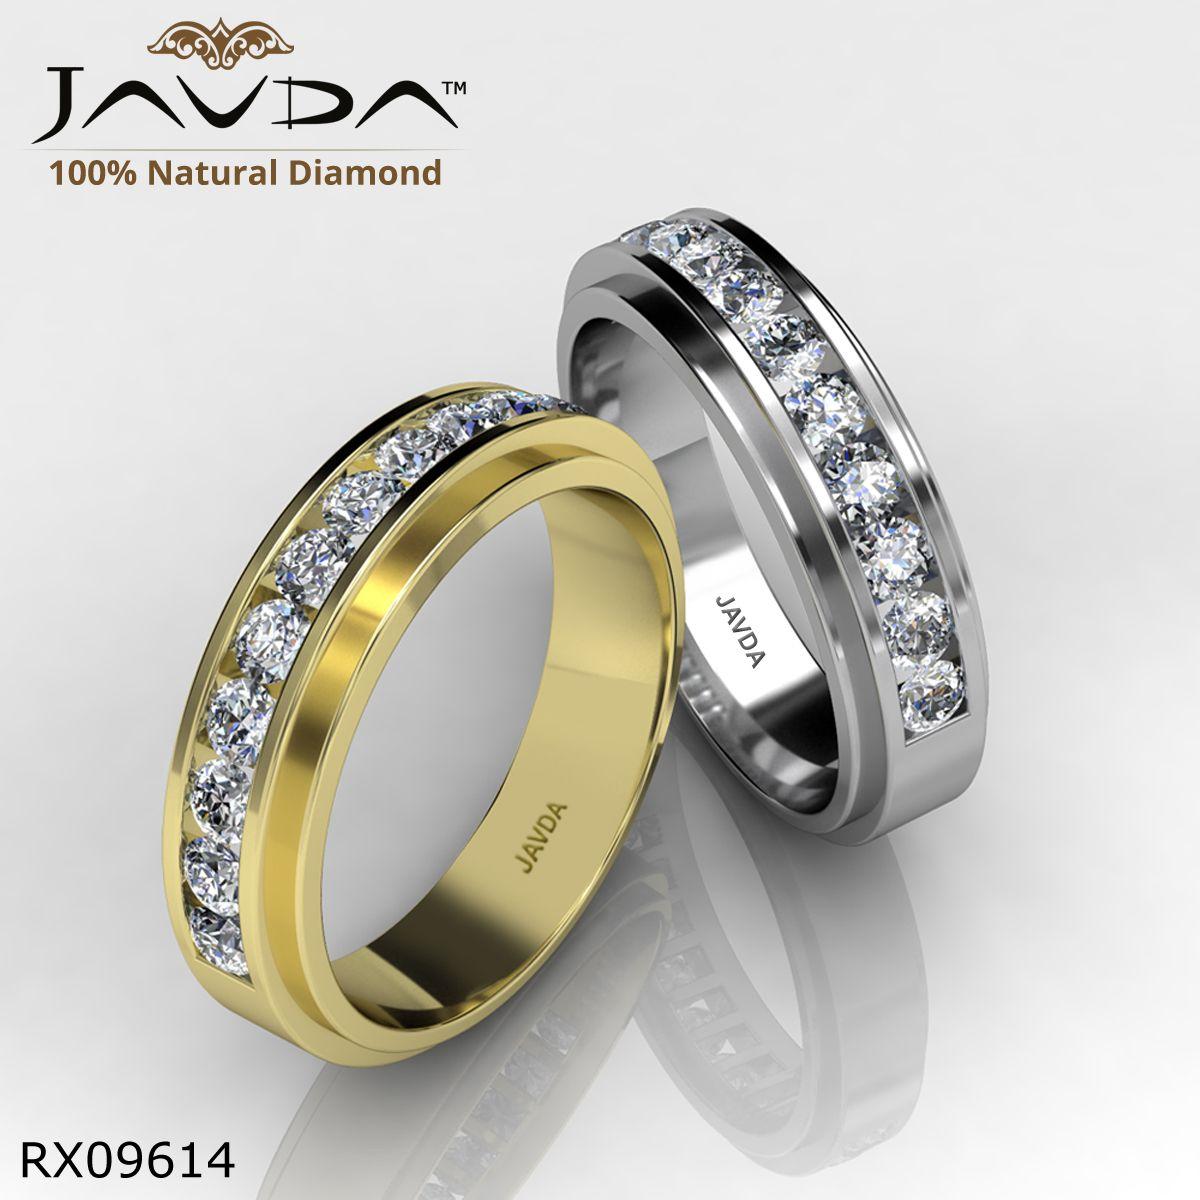 Round Diamond Mens Half Wedding Band Ring made in 14k